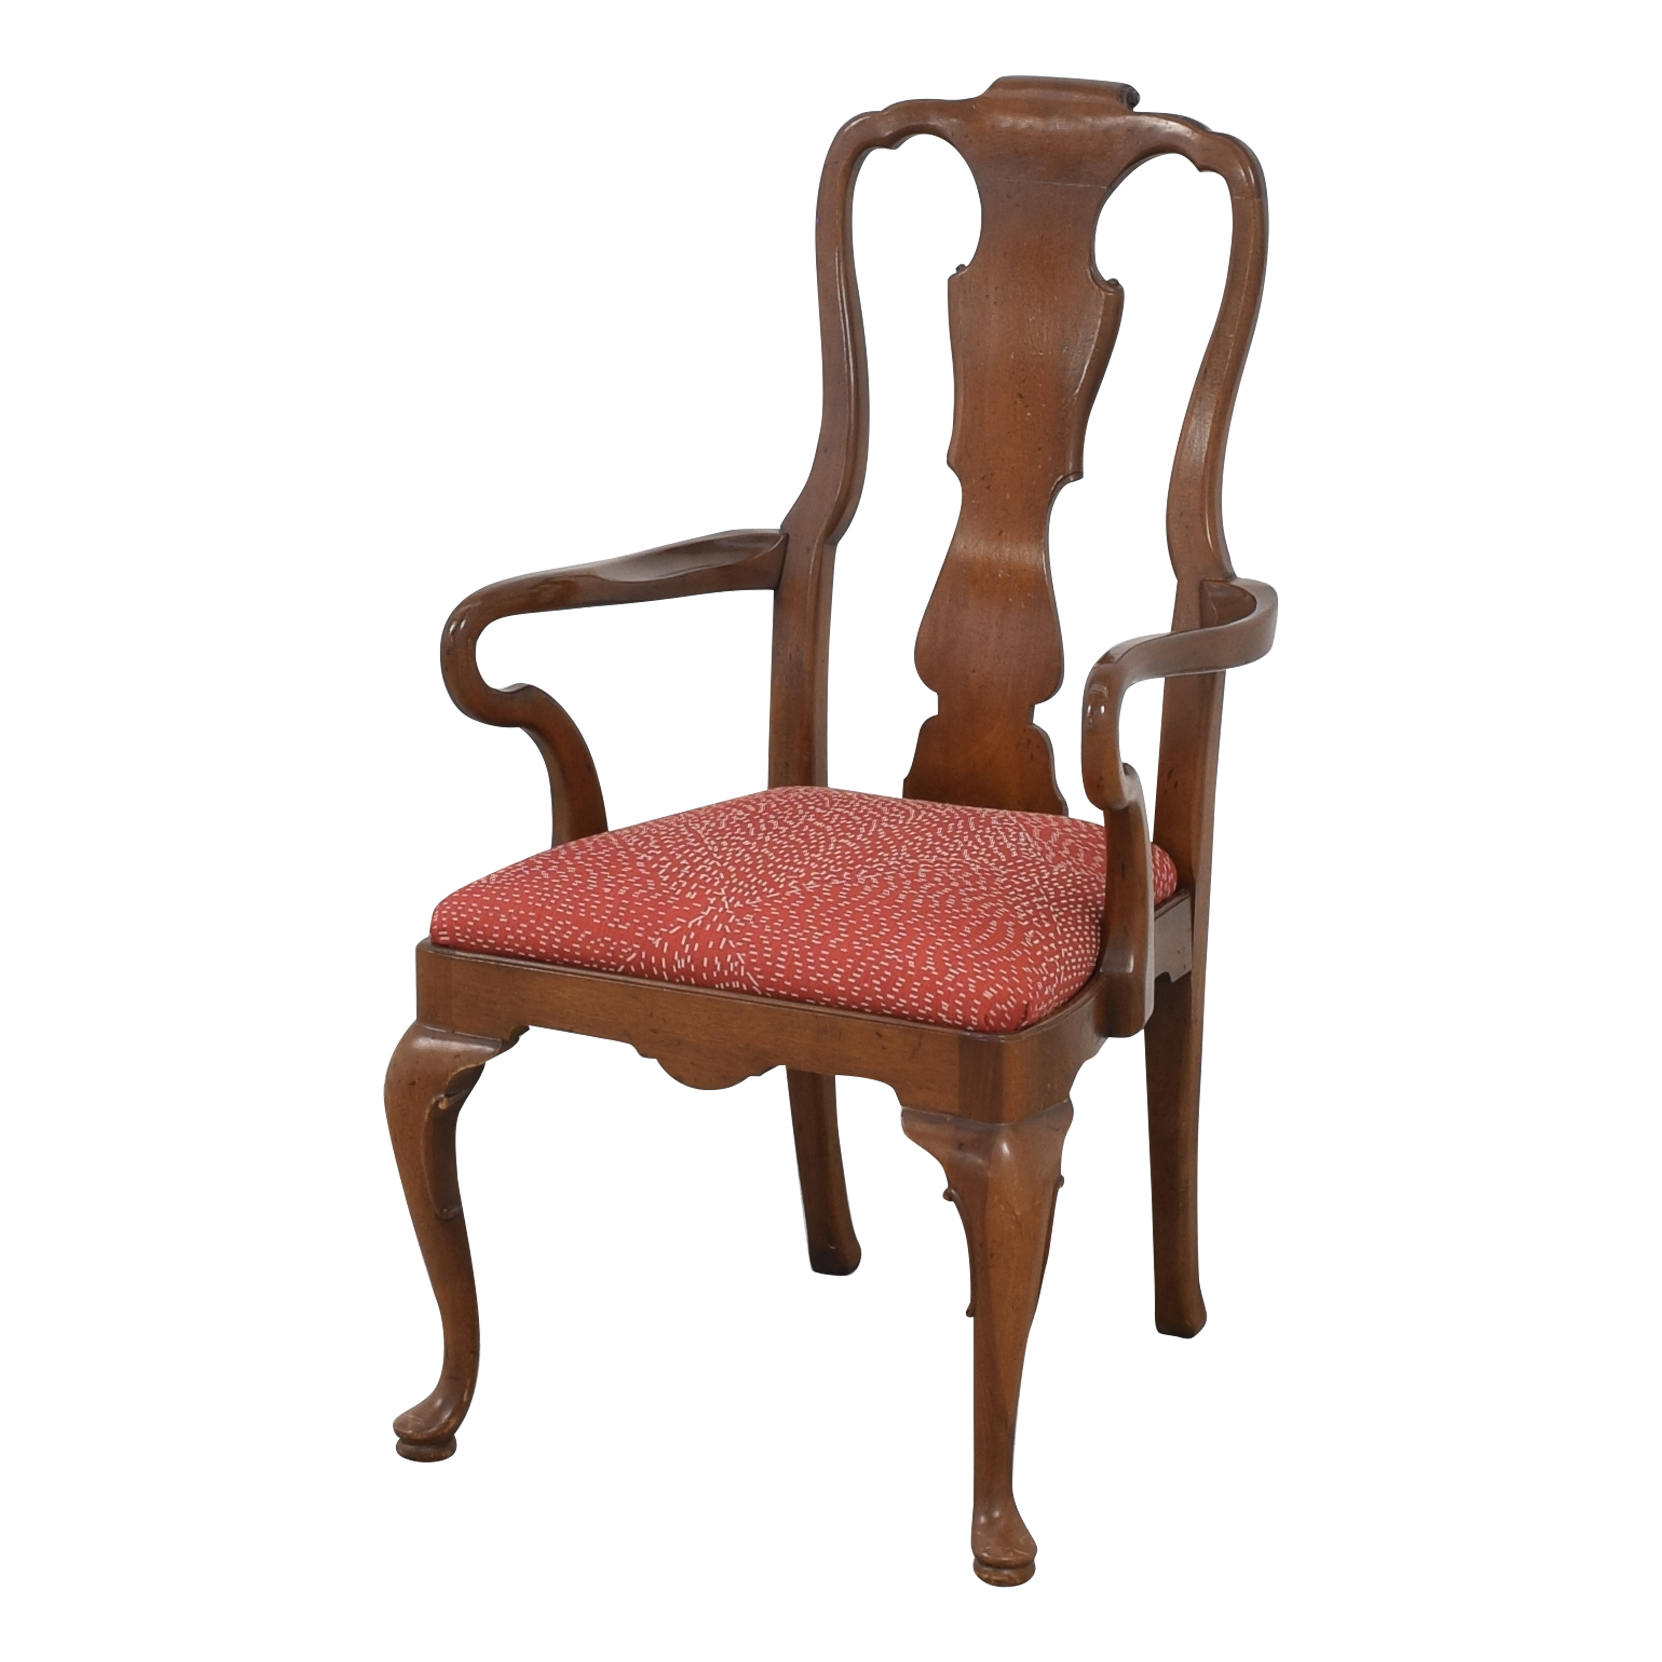 Henredon Furniture Henredon Queen Anne Chairs nyc